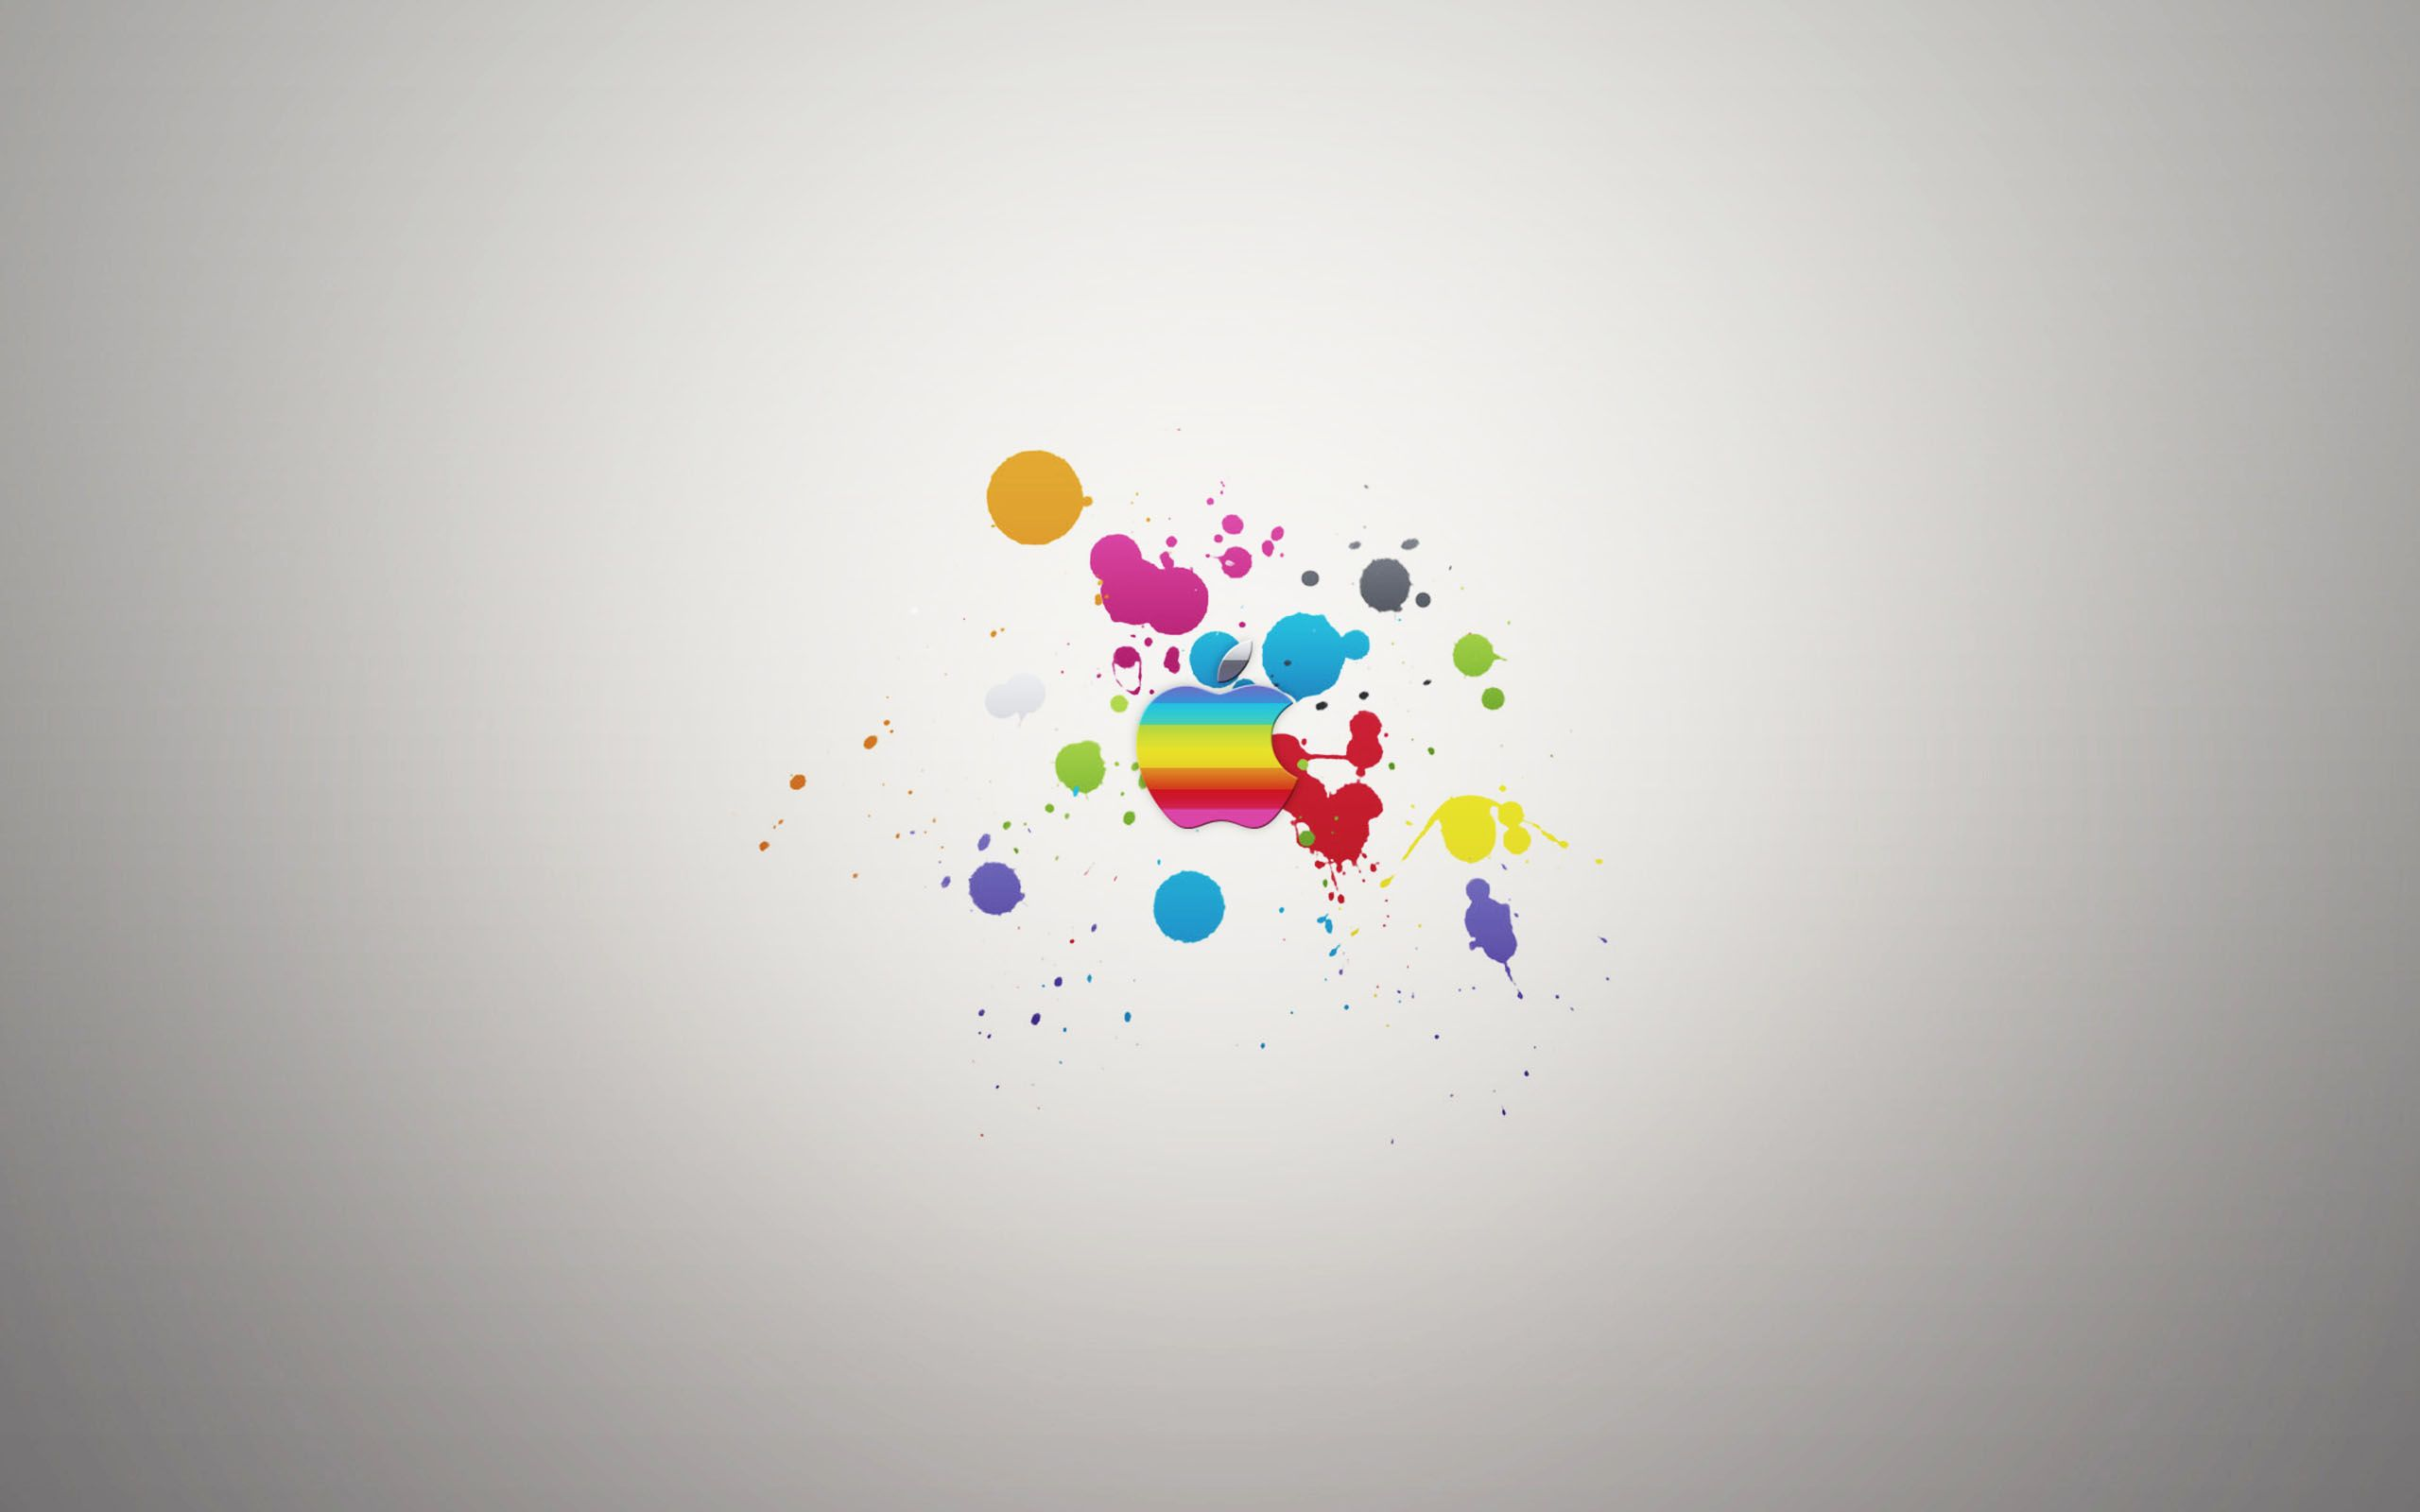 Wallpaper Apple Mac Colorat